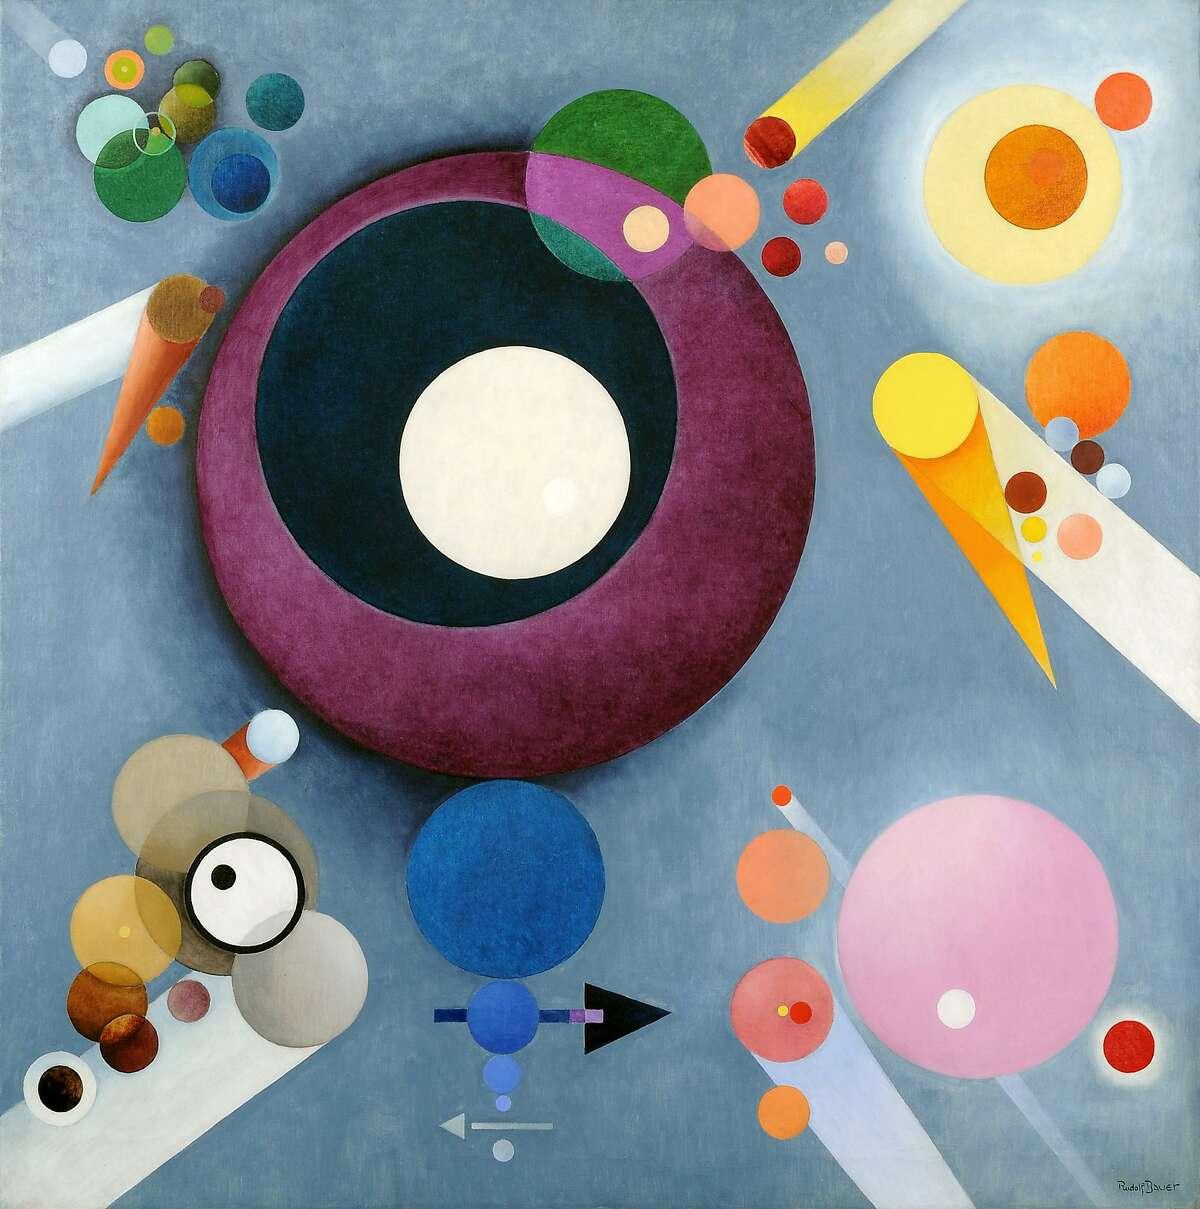 Rudolf Bauer's Spiritual Pleasures, oil on canvas, 1935-1938.